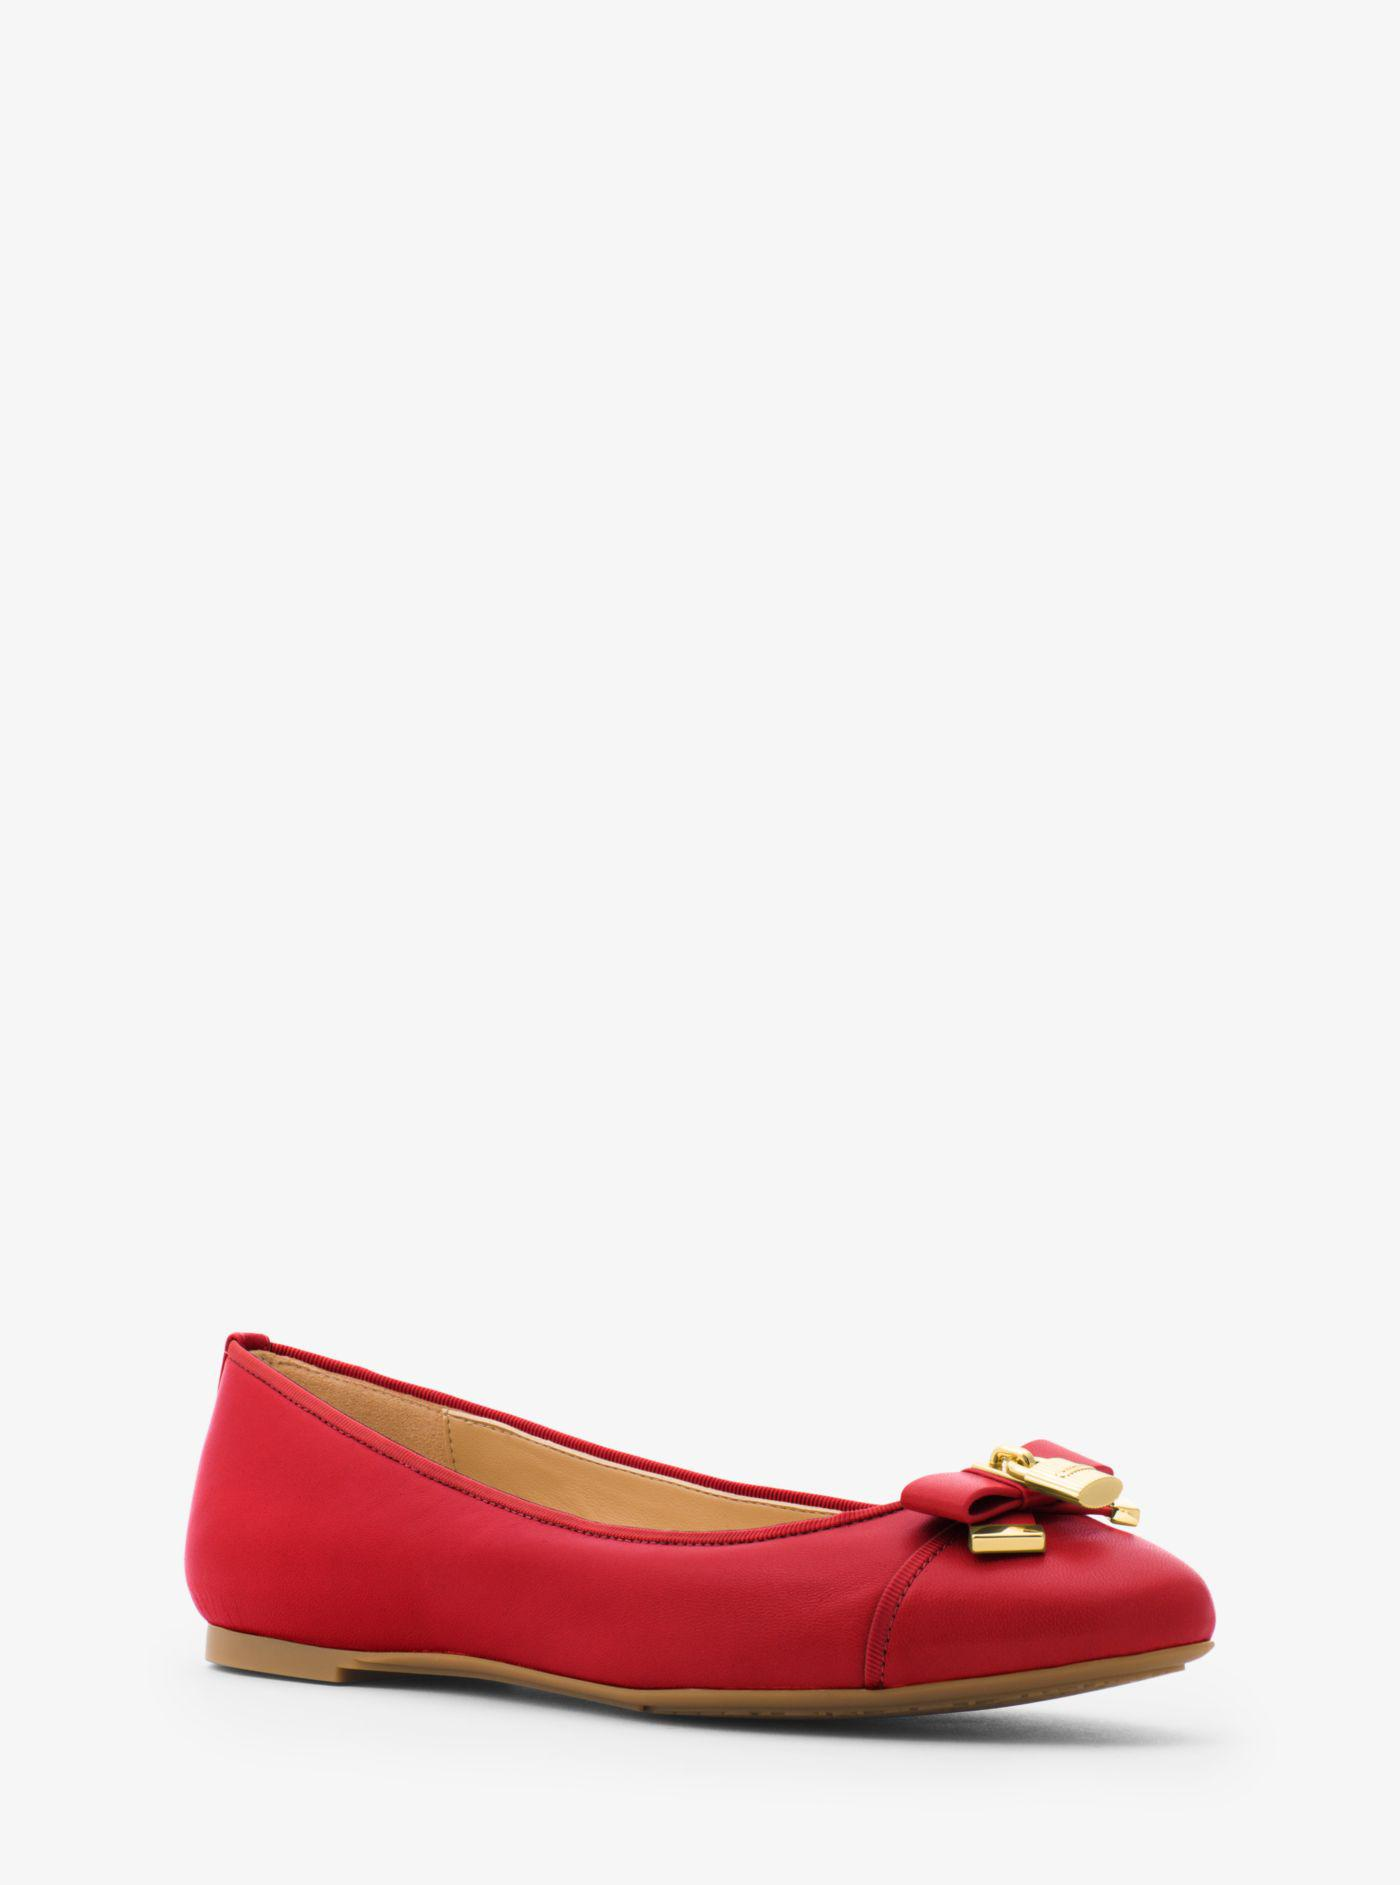 Michael Kors Alice Leather Ballet Flat